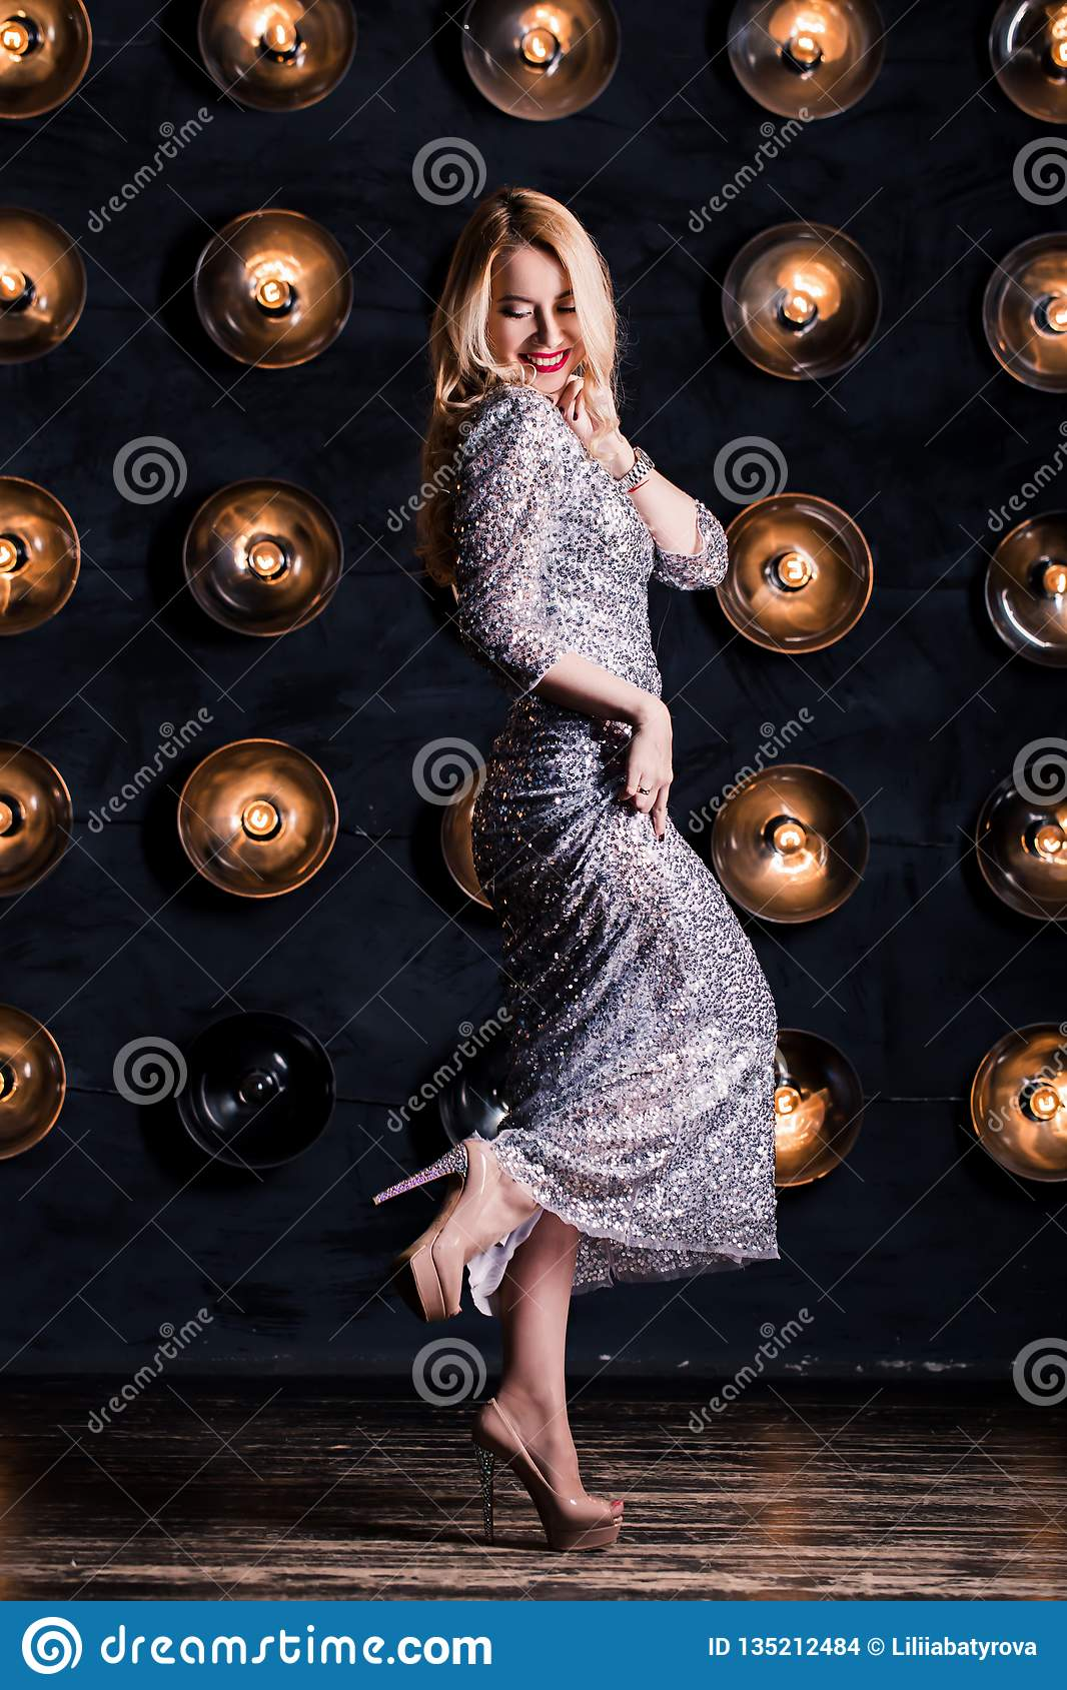 Happy joyful blond woman in a long silver dress on a black background. Celebration, party, new year, birthday